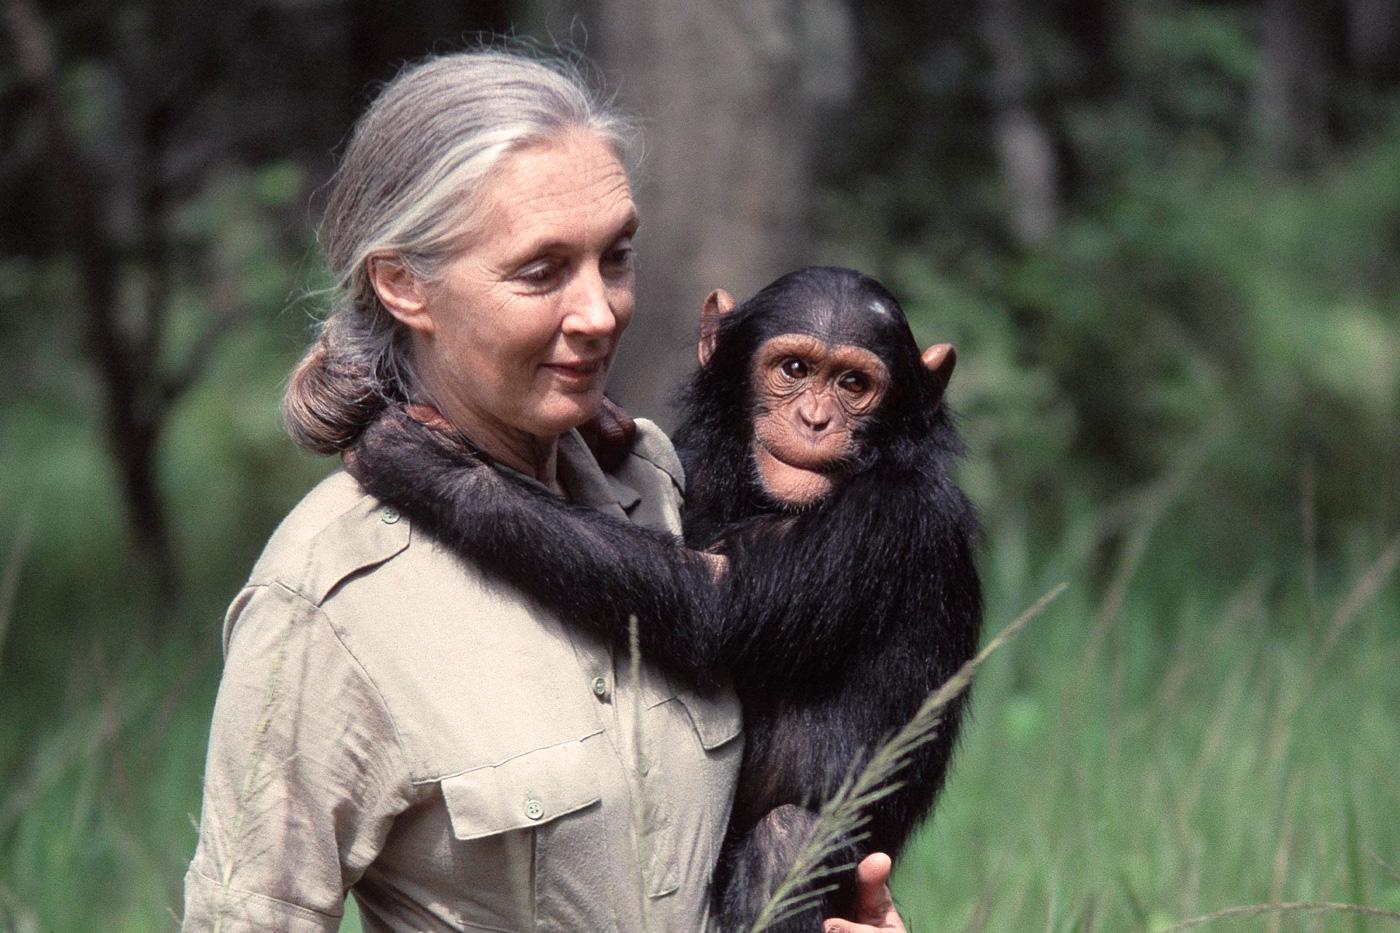 Extinción masiva de animales; Jane Goodall advierte tráfico ilegal de especies | ExpokNews